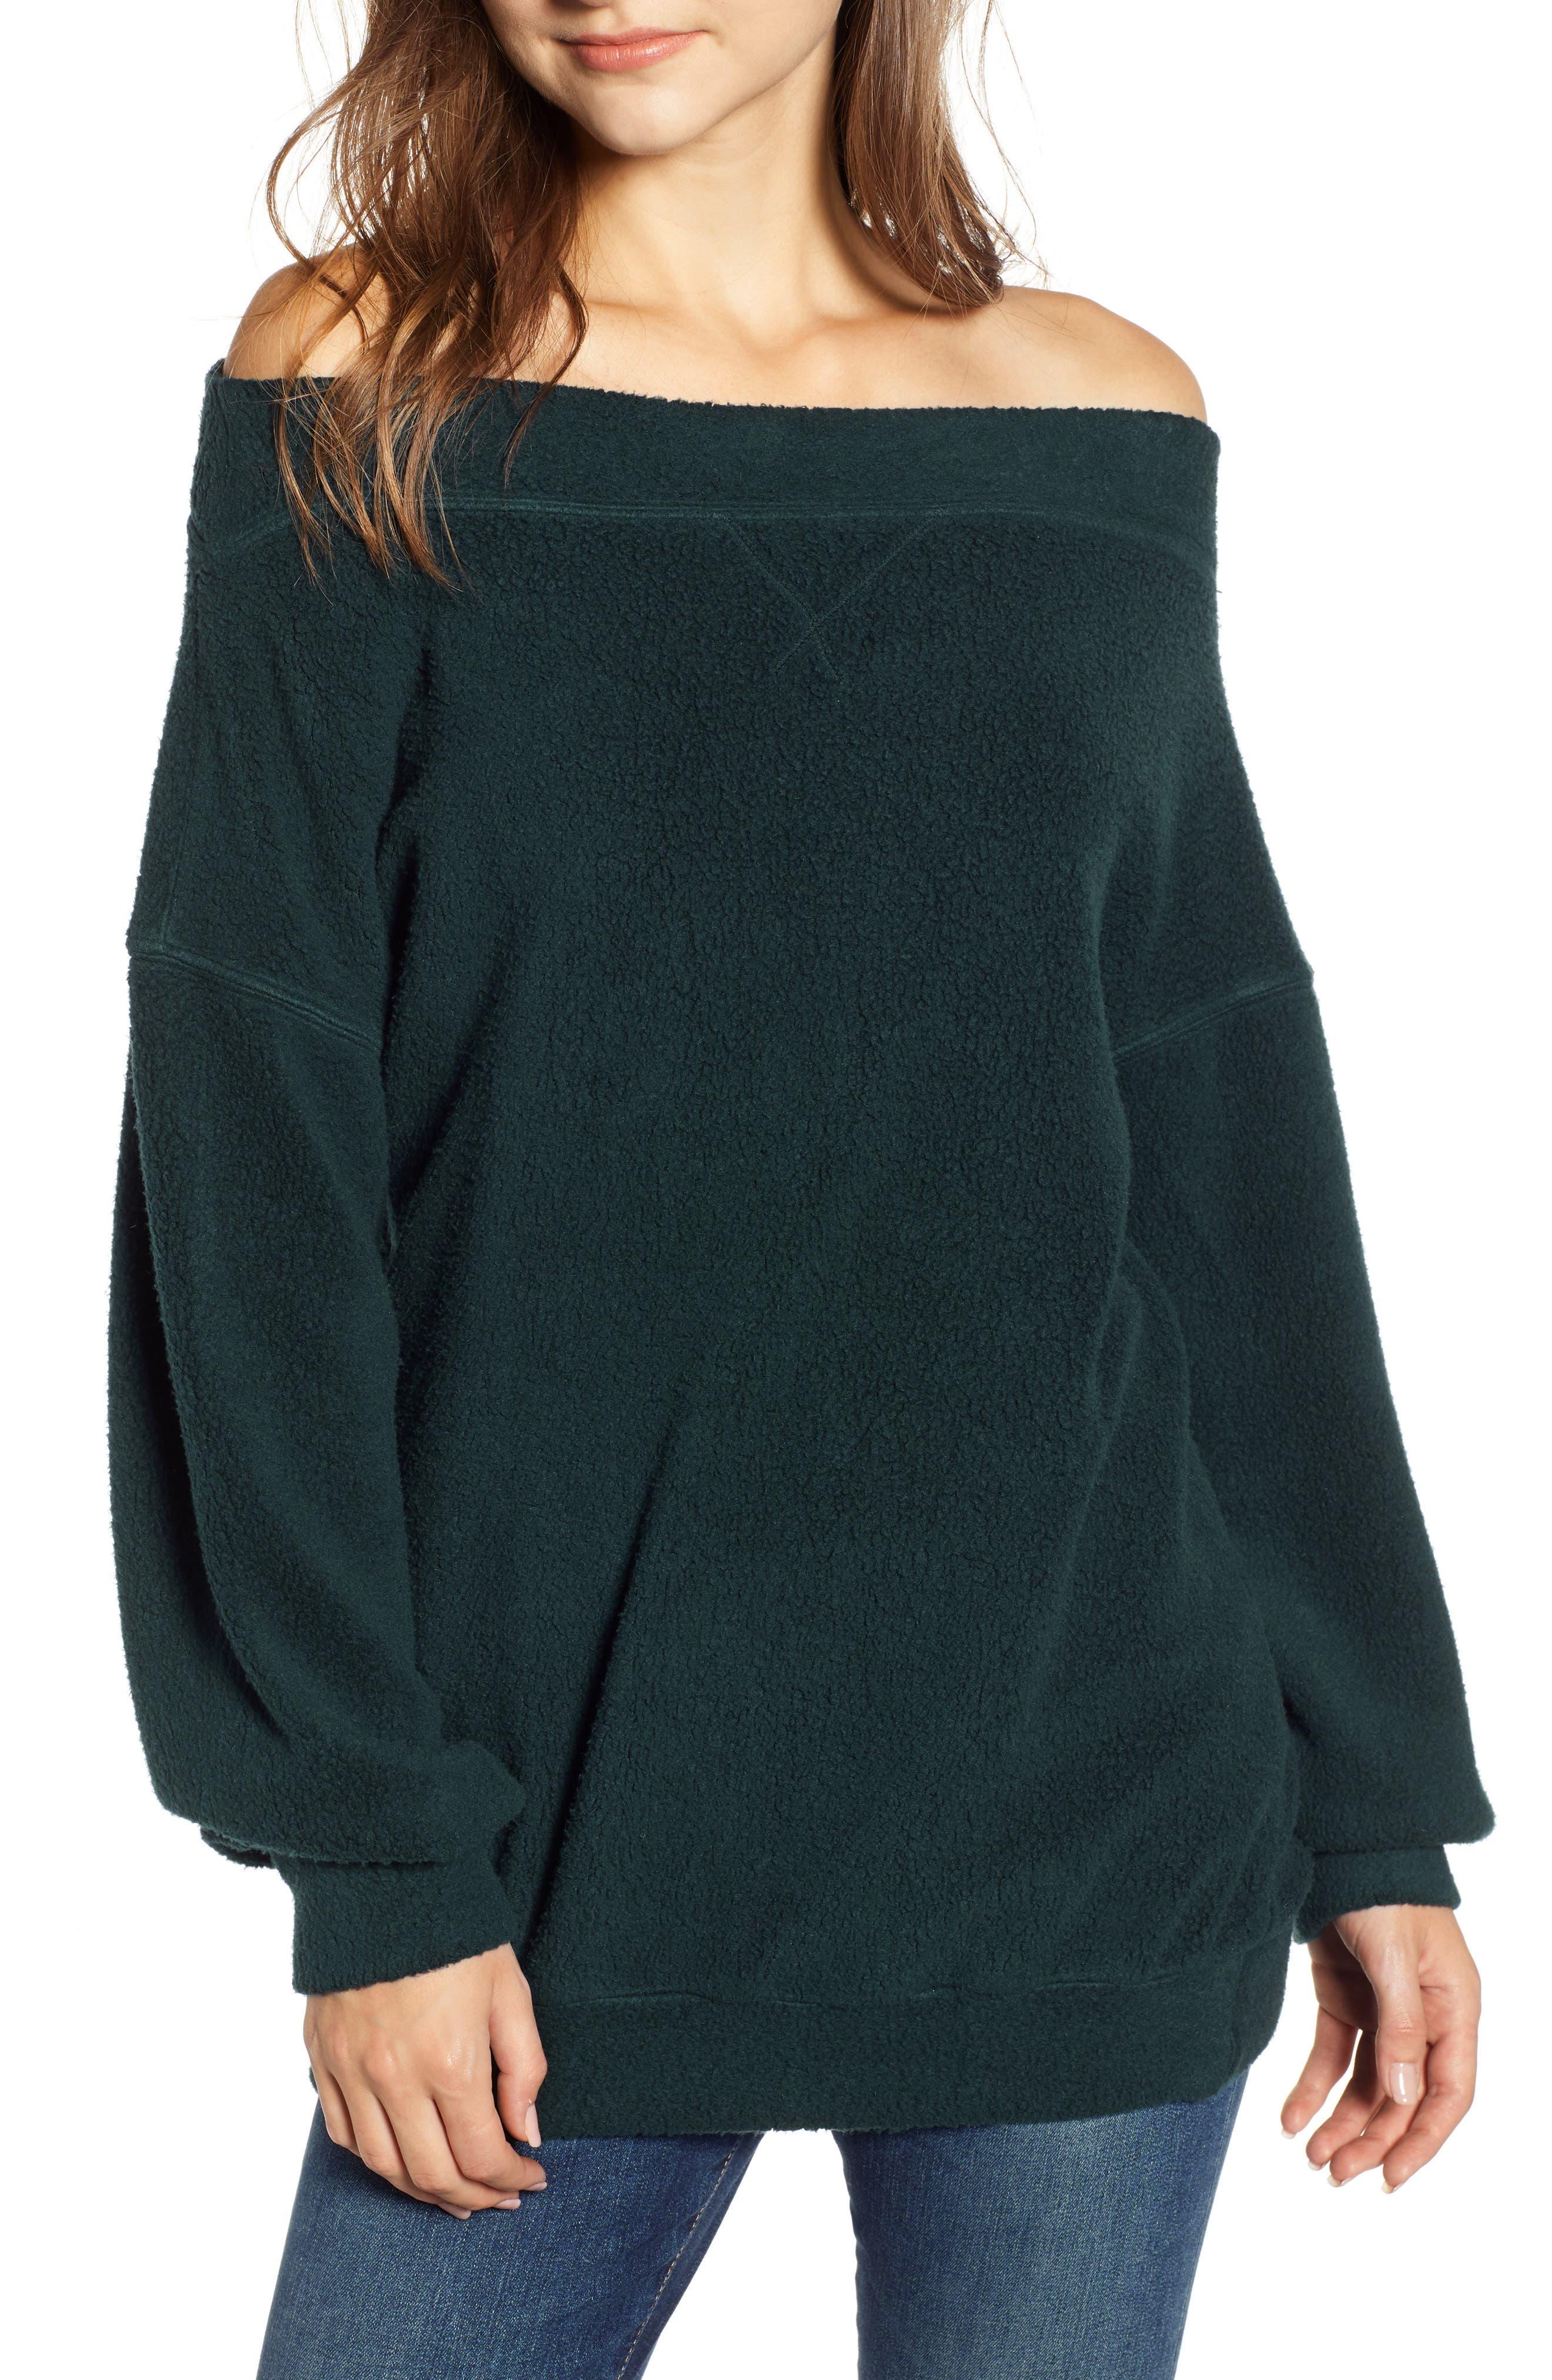 Off the Shoulder Fleece Sweatshirt,                             Main thumbnail 1, color,                             300